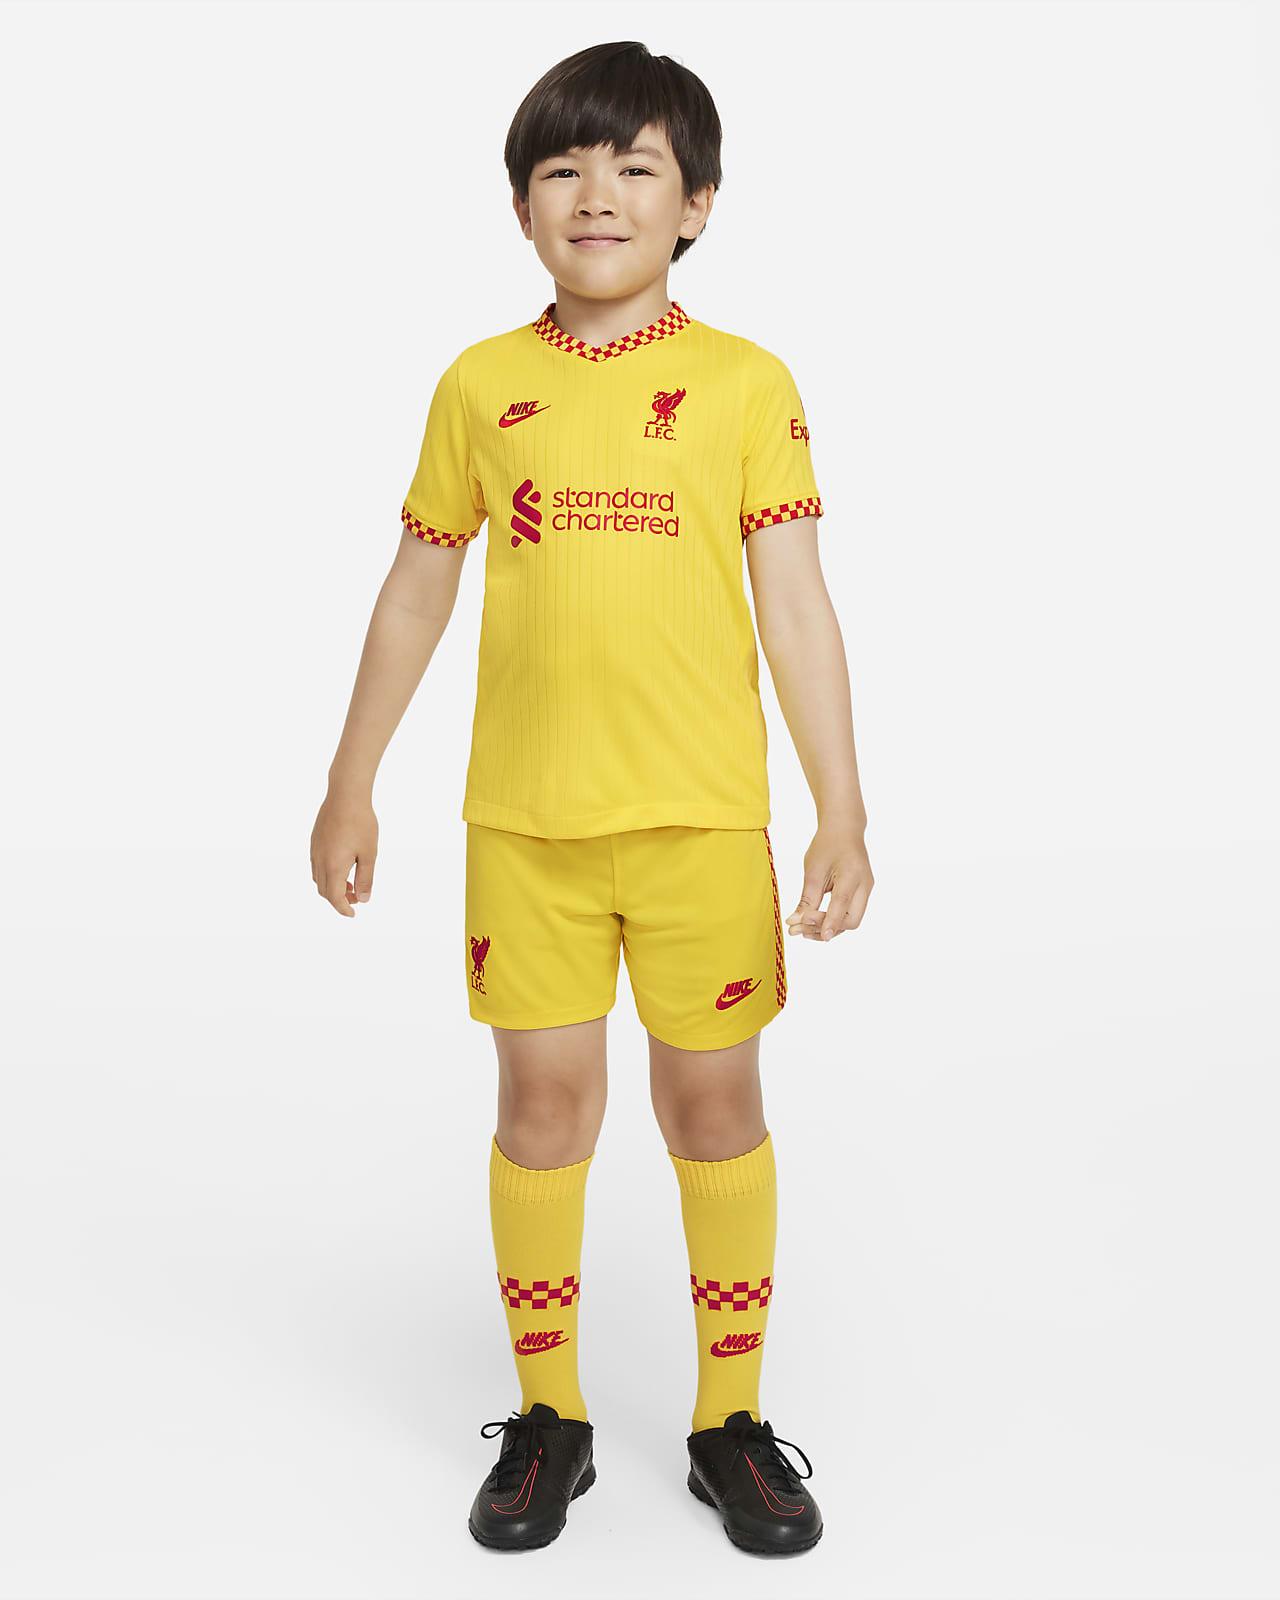 Liverpool FC 2021/22 harmadik Nike Dri-FIT futballszett gyerekeknek